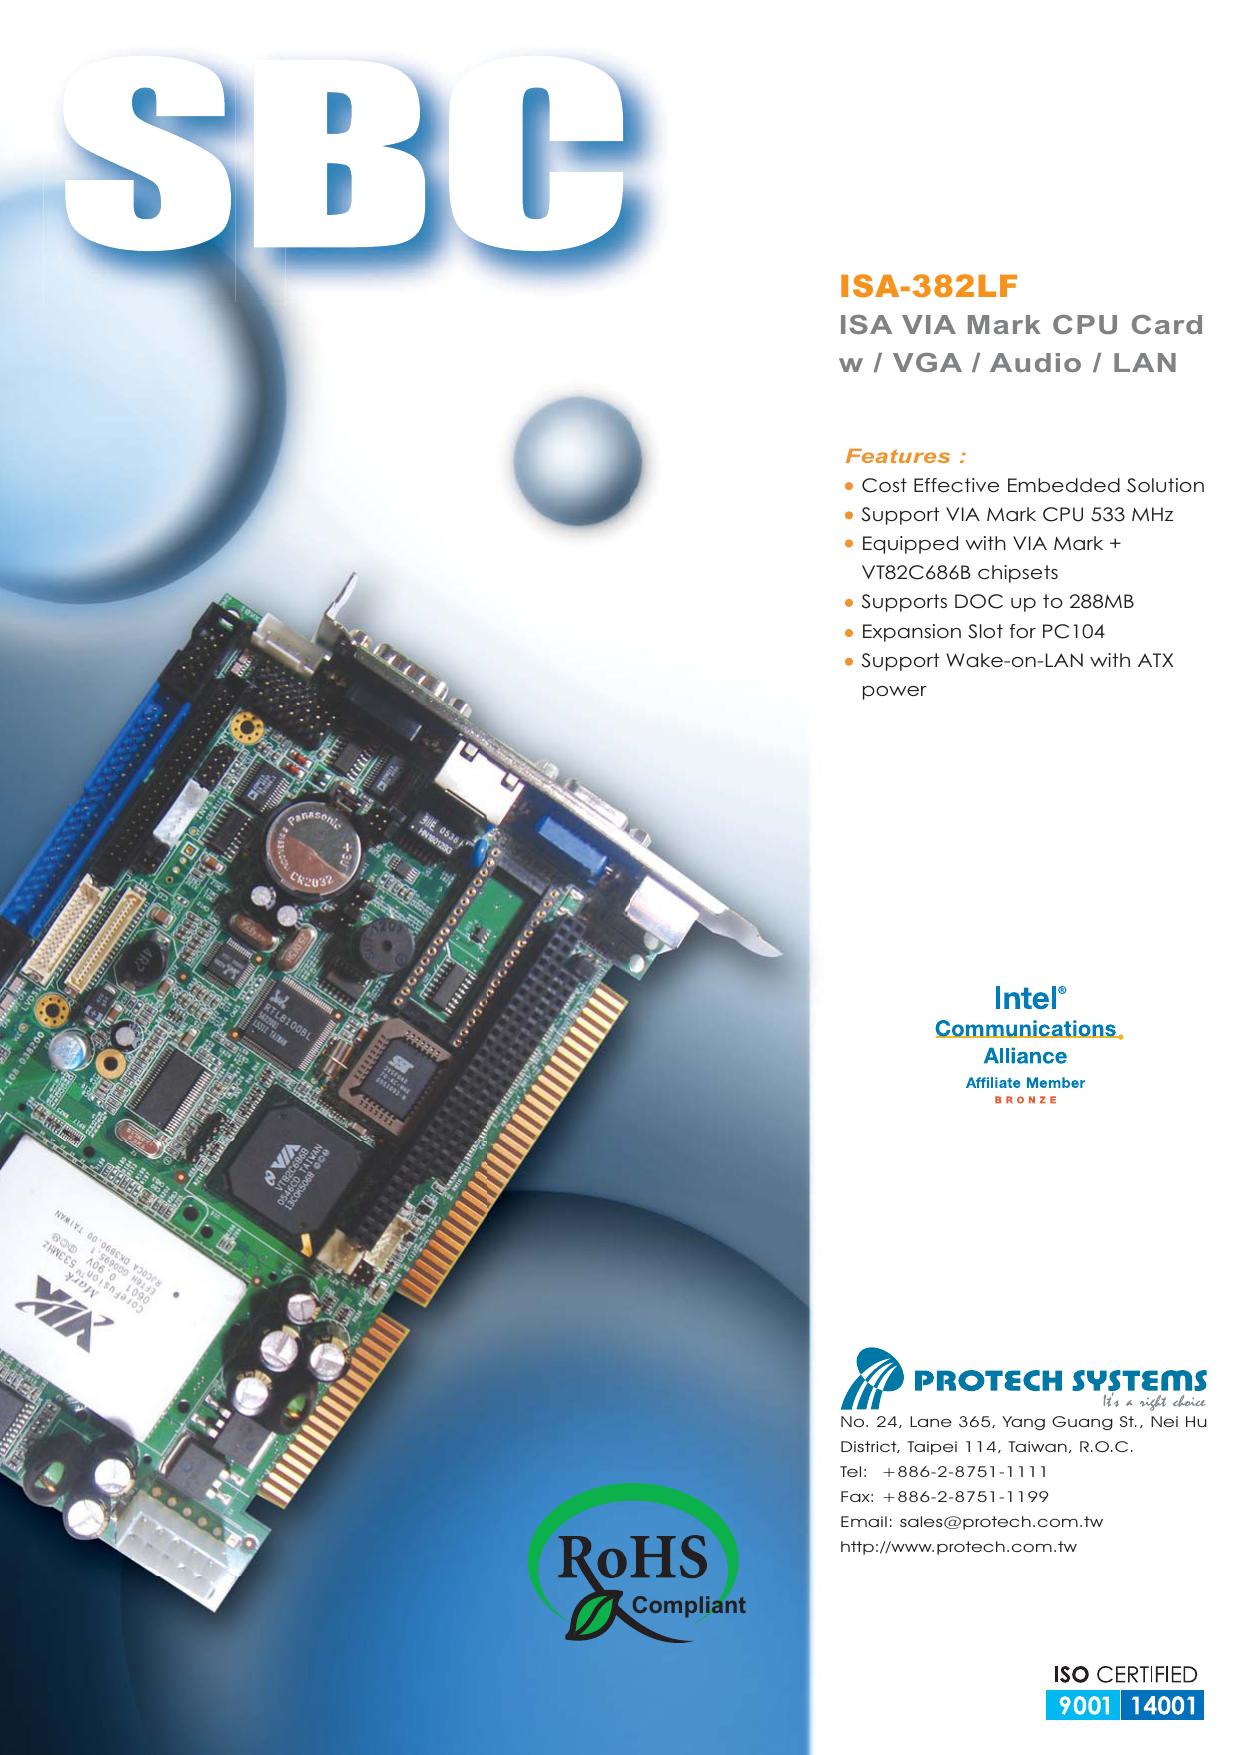 Protech ISA-382LF VGA Windows 7 64-BIT